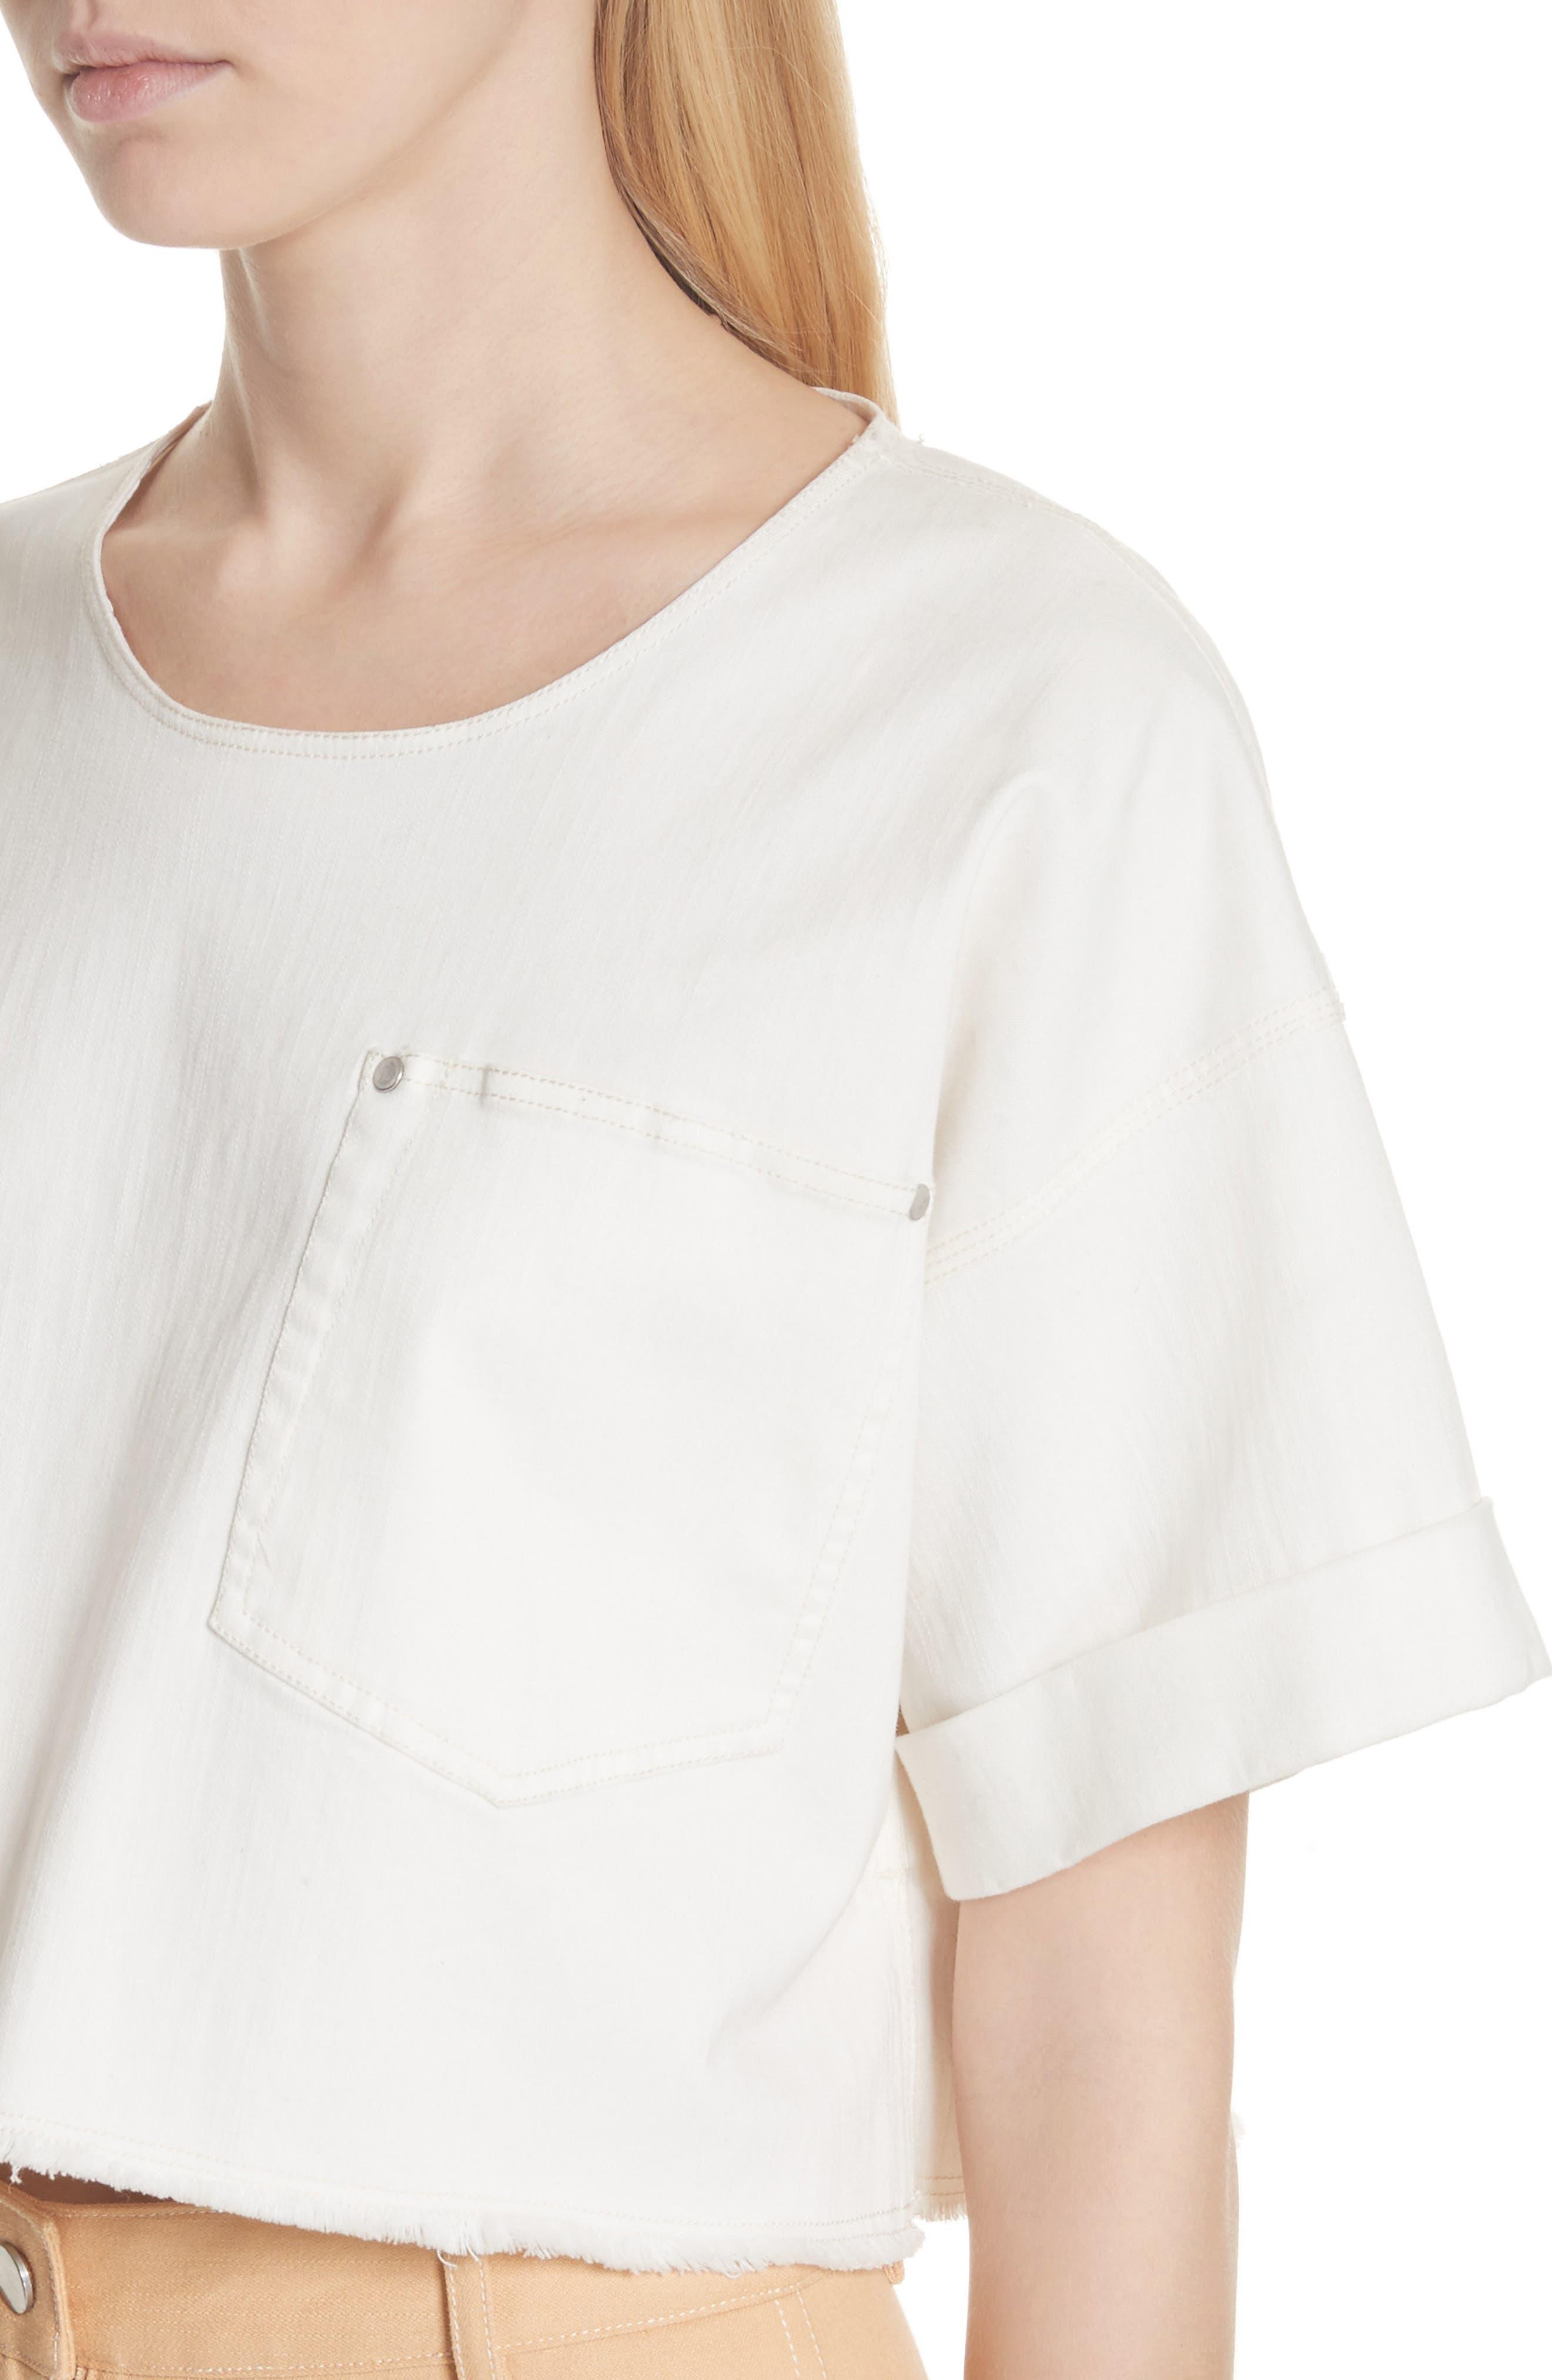 Tinsley Denim Crop Top,                             Alternate thumbnail 4, color,                             White